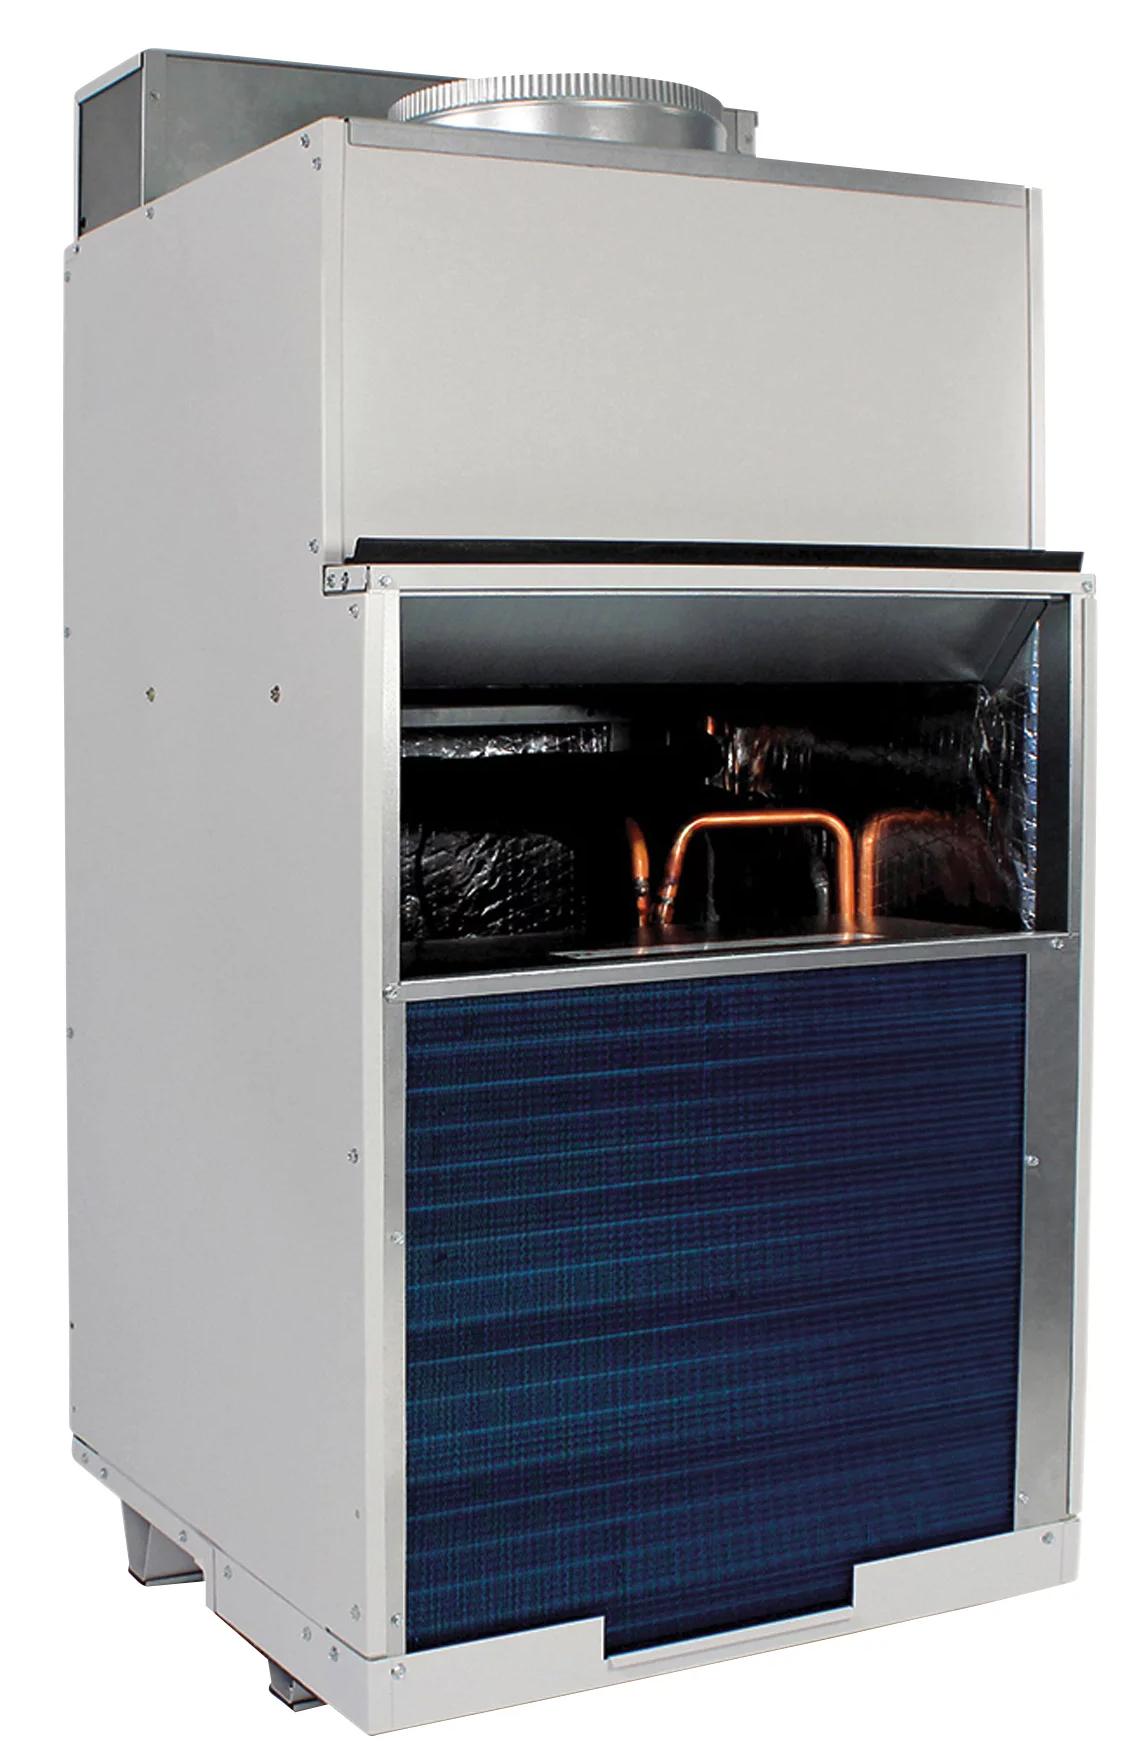 Amana AVH183H50AXXX 18000 BTU Vertical Terminal Air Conditioner with Heat Pump (VTAC) - 30 Amp